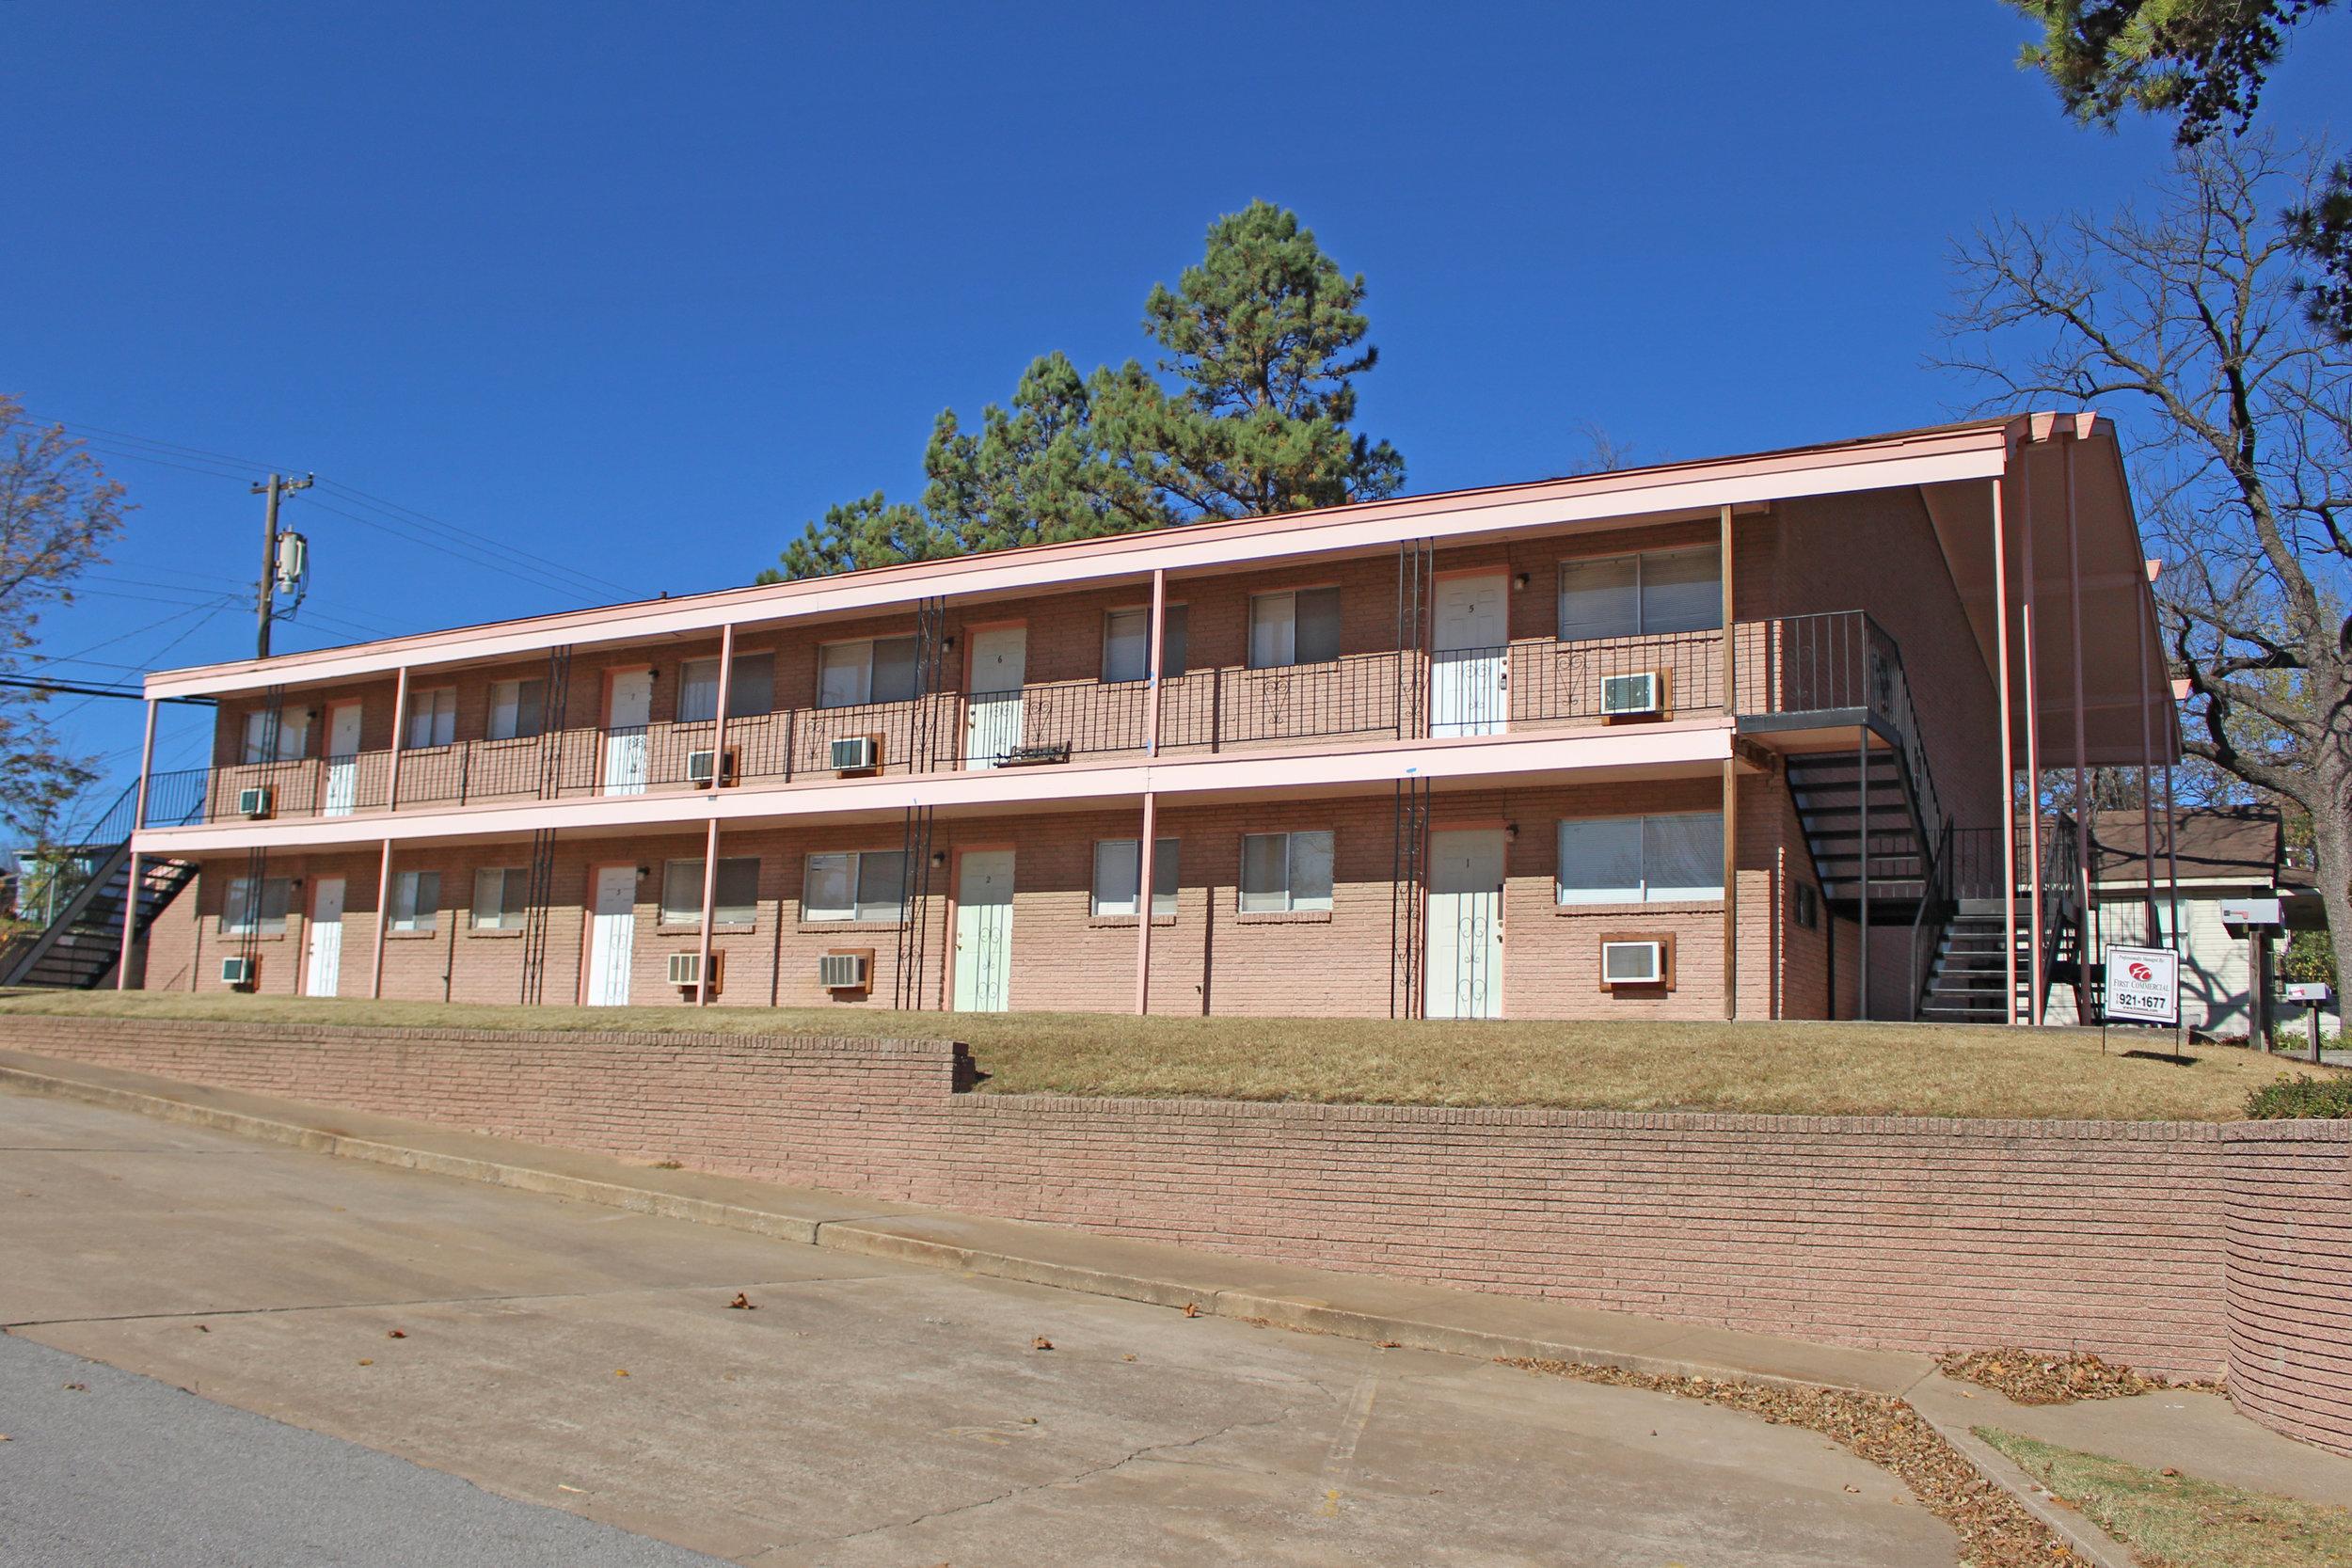 yoder apartments 500 north garfield